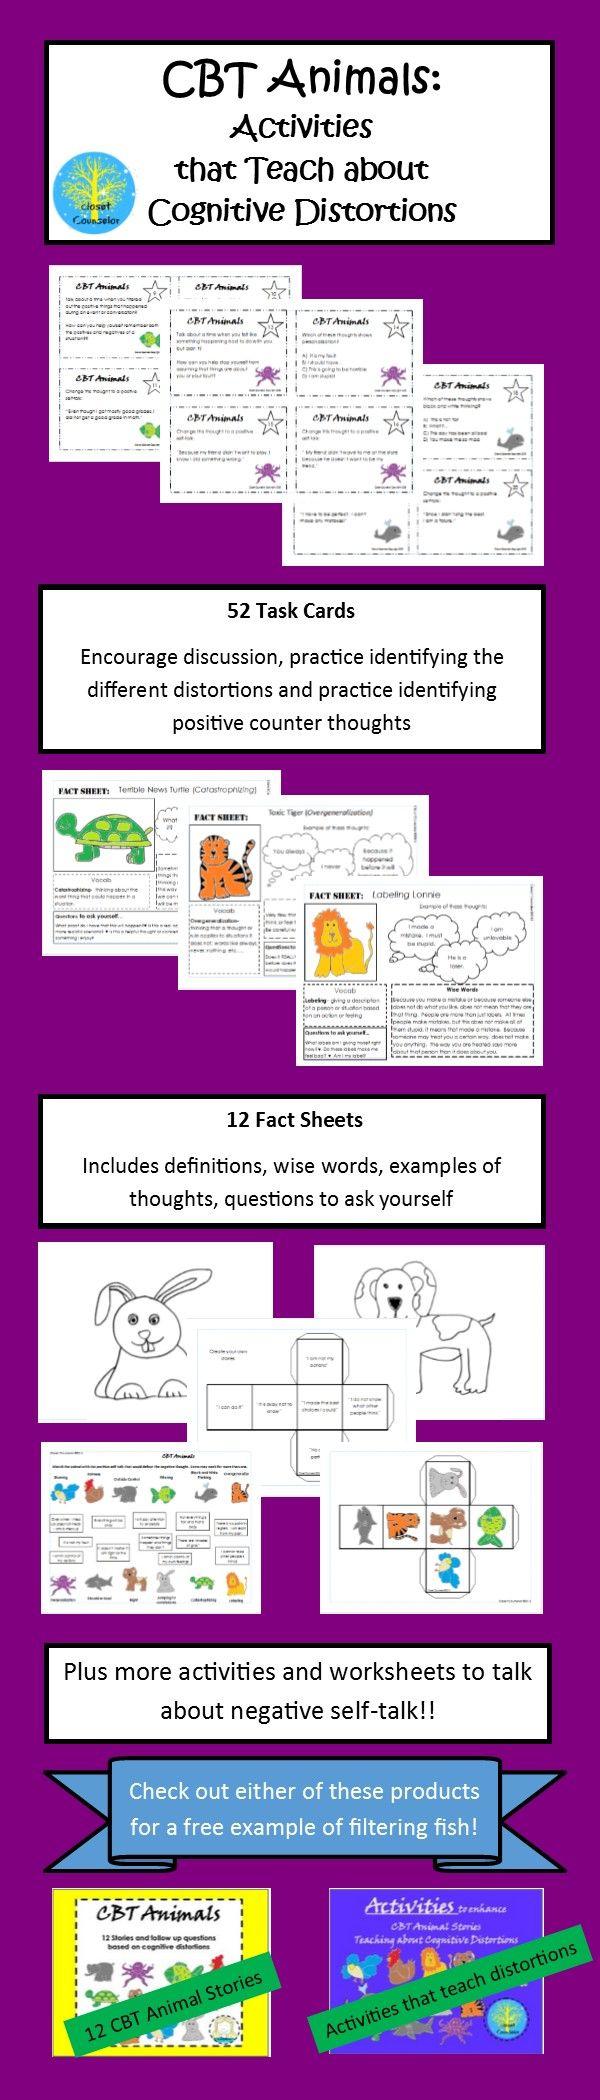 Workbooks tf cbt workbook for children : CBT Animals: Activities that Teach about Cognitive Distortions ...